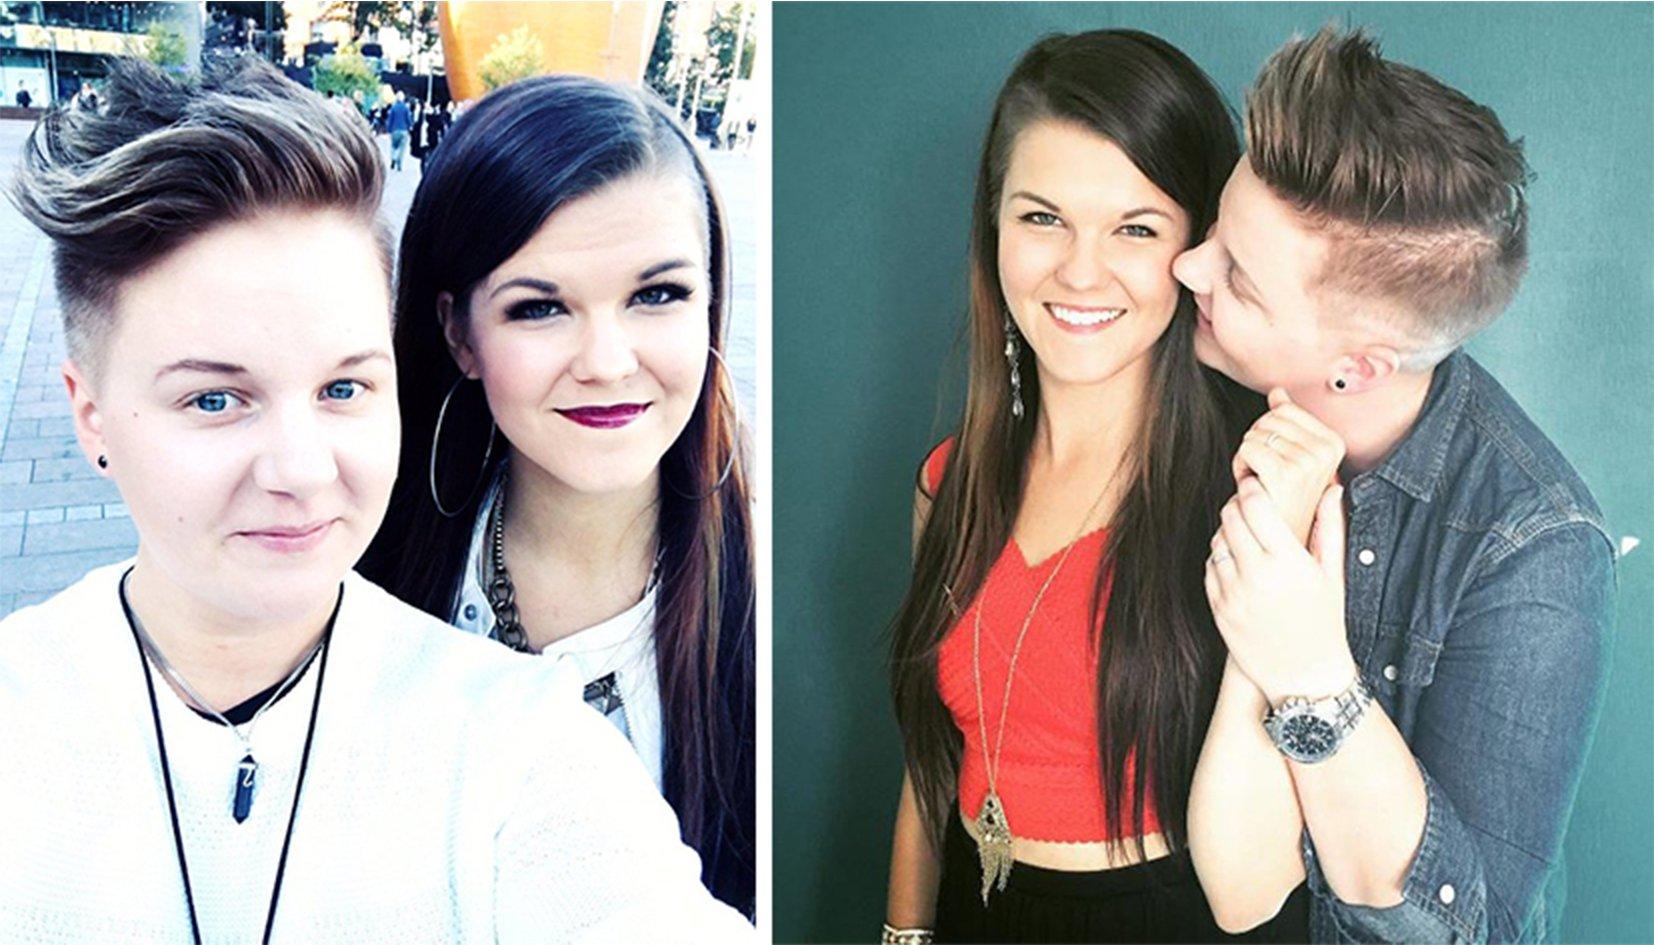 Saara Aalto (X Factor UK) vient de se fiancer avec sa plus grande fan